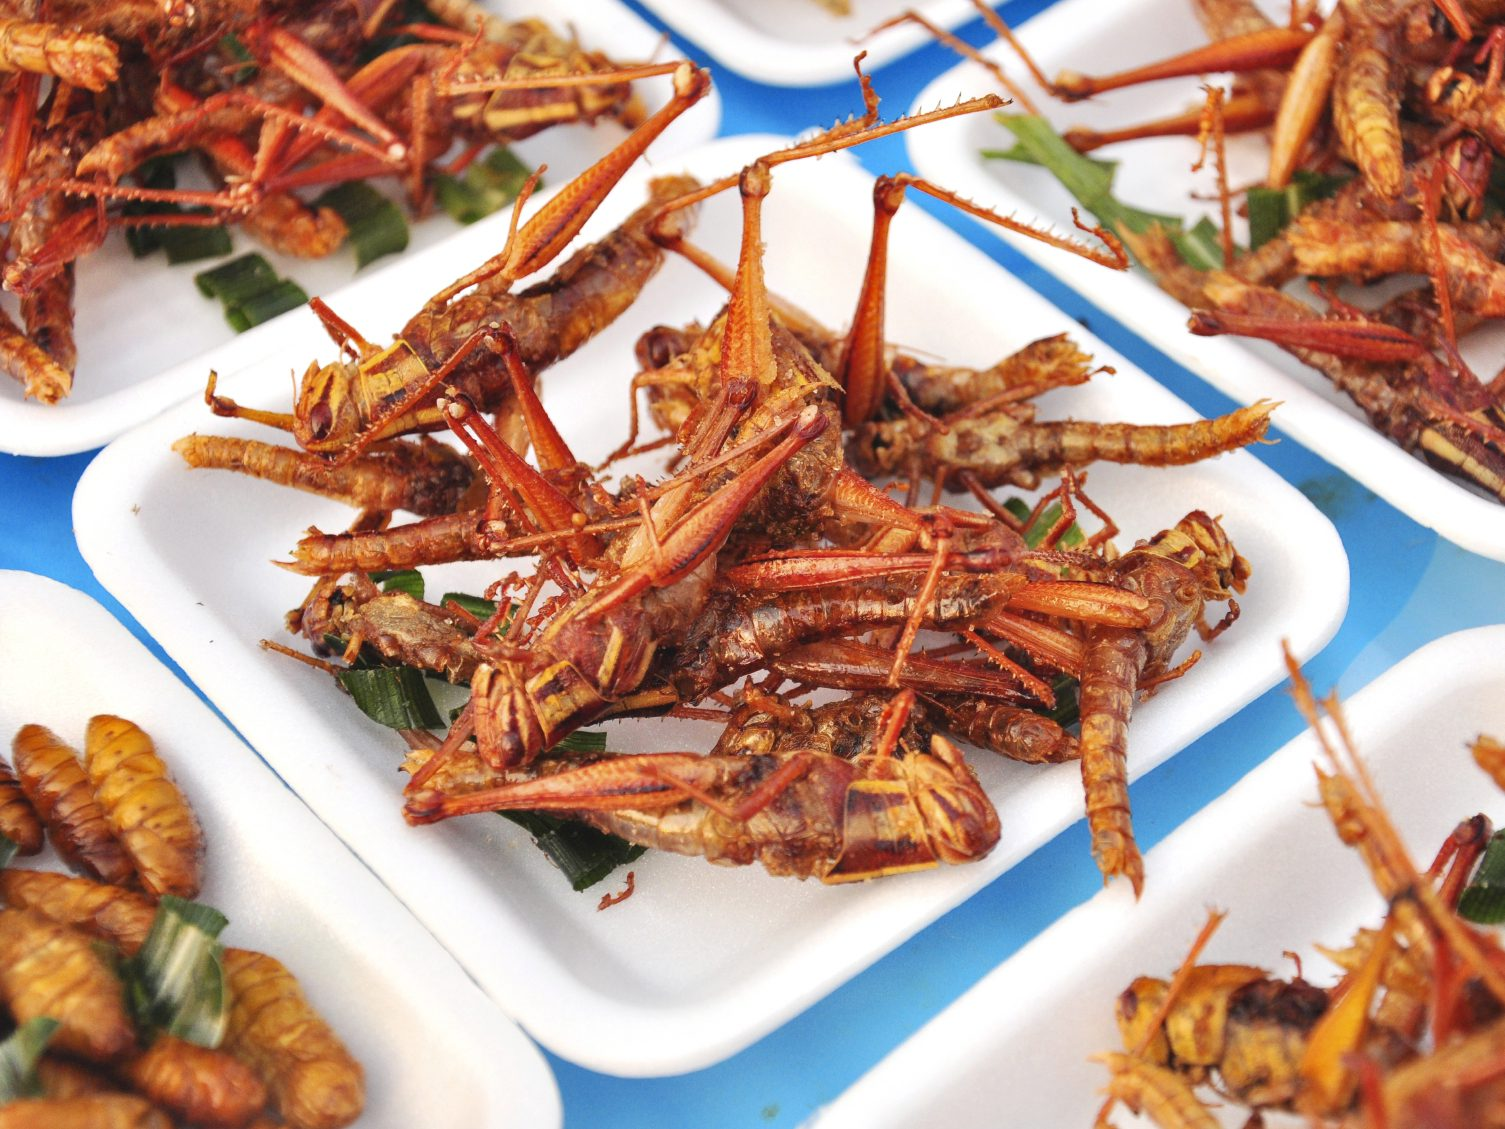 Les insectes : superaliments du futur?